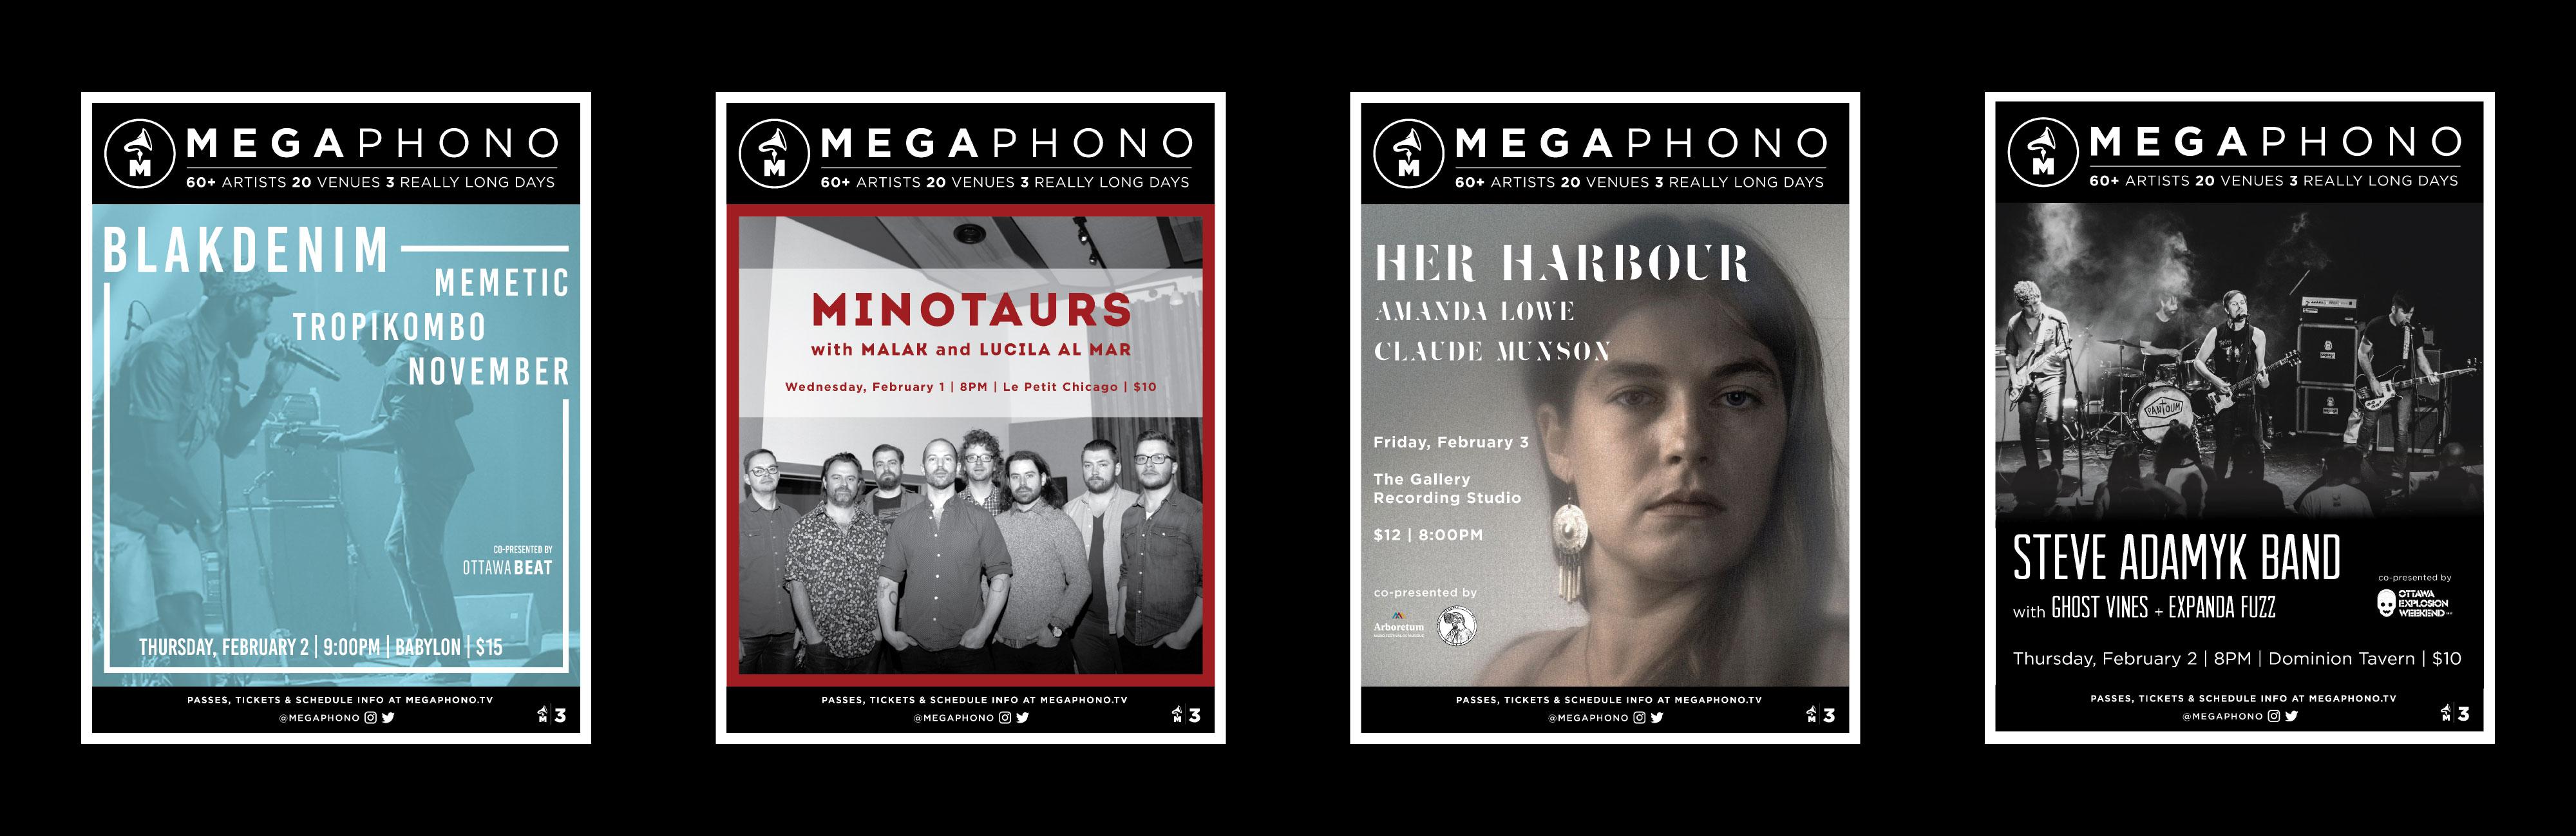 megaphono-posters-01